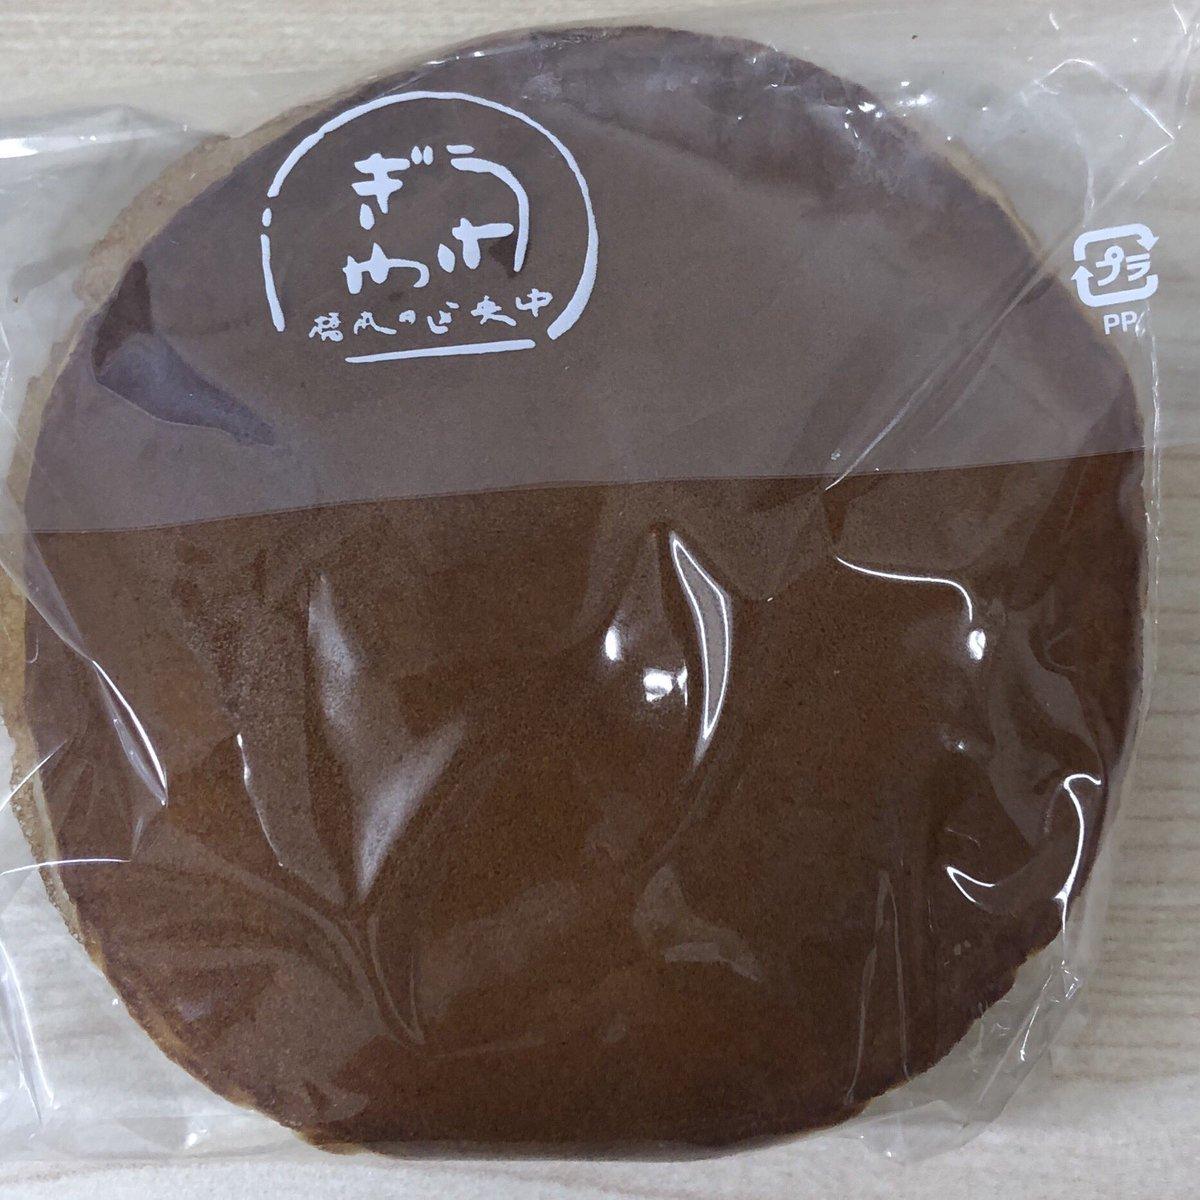 test ツイッターメディア - HOMEI  TOKYO  今日のおやつ 『うさぎや』のどら焼き😋  絶妙の粒あんとフワフワの生地✨  North🐎  #HOMEI #ウィークリージェル https://t.co/uPafQR6xne